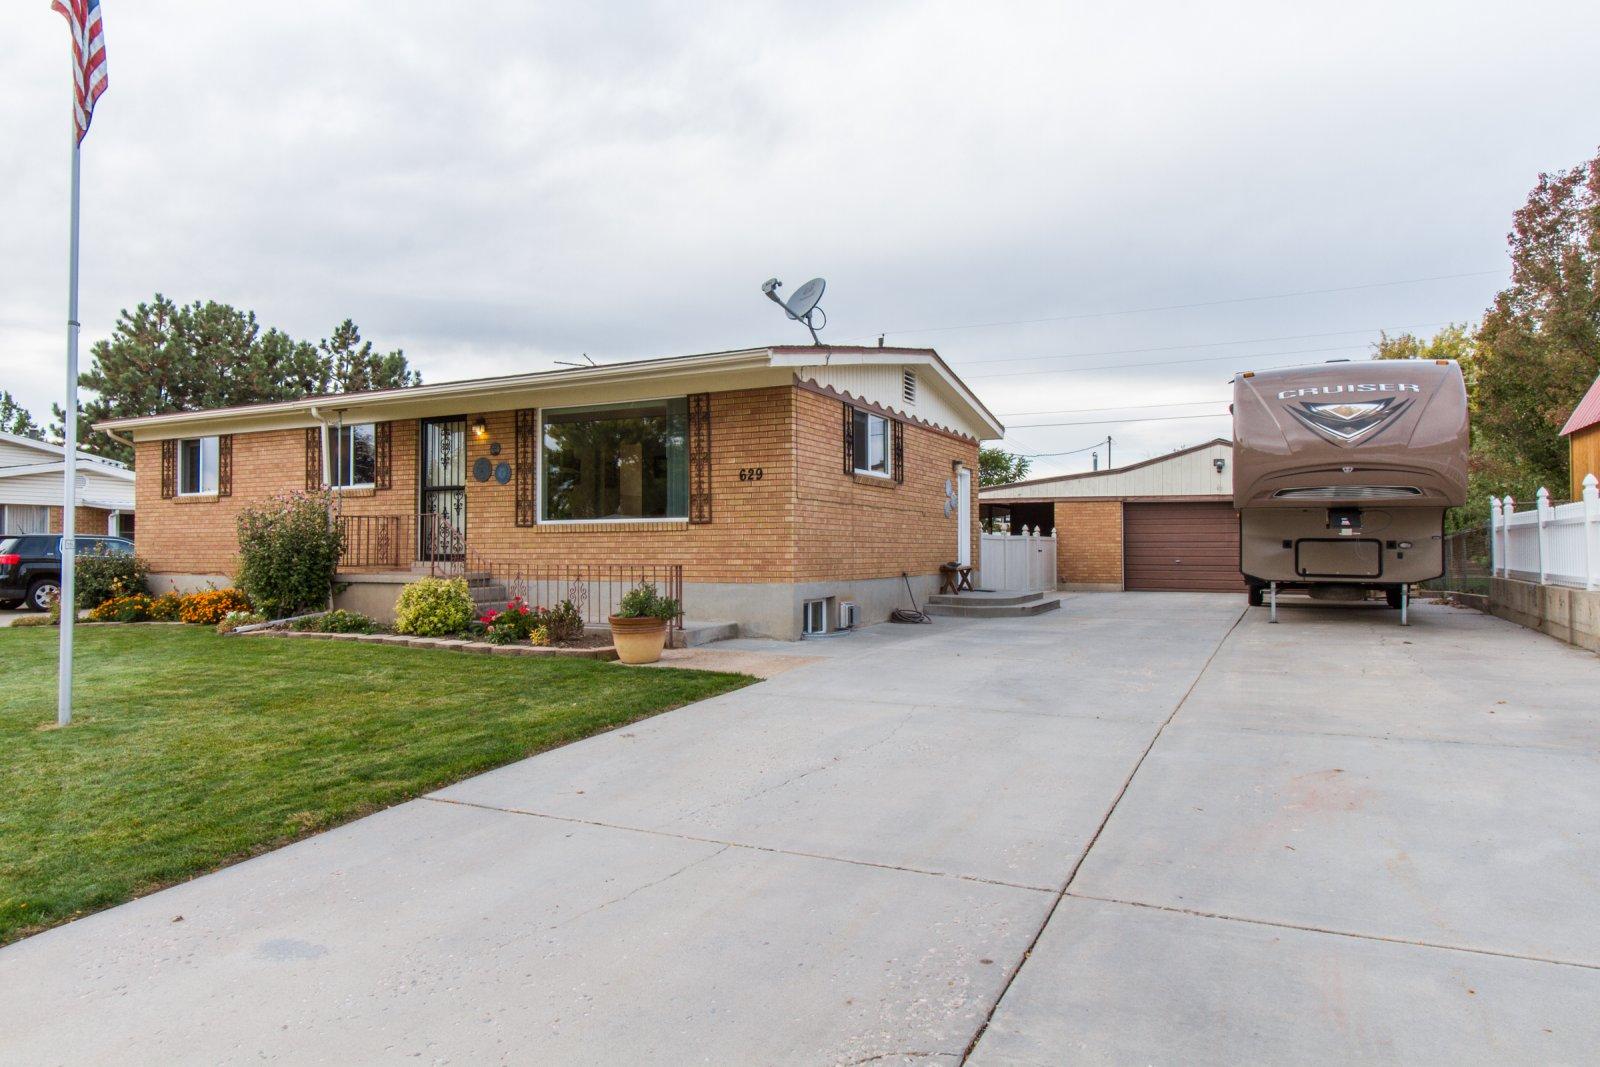 home for sale Layton Utah by Utahhomes.biz property picture